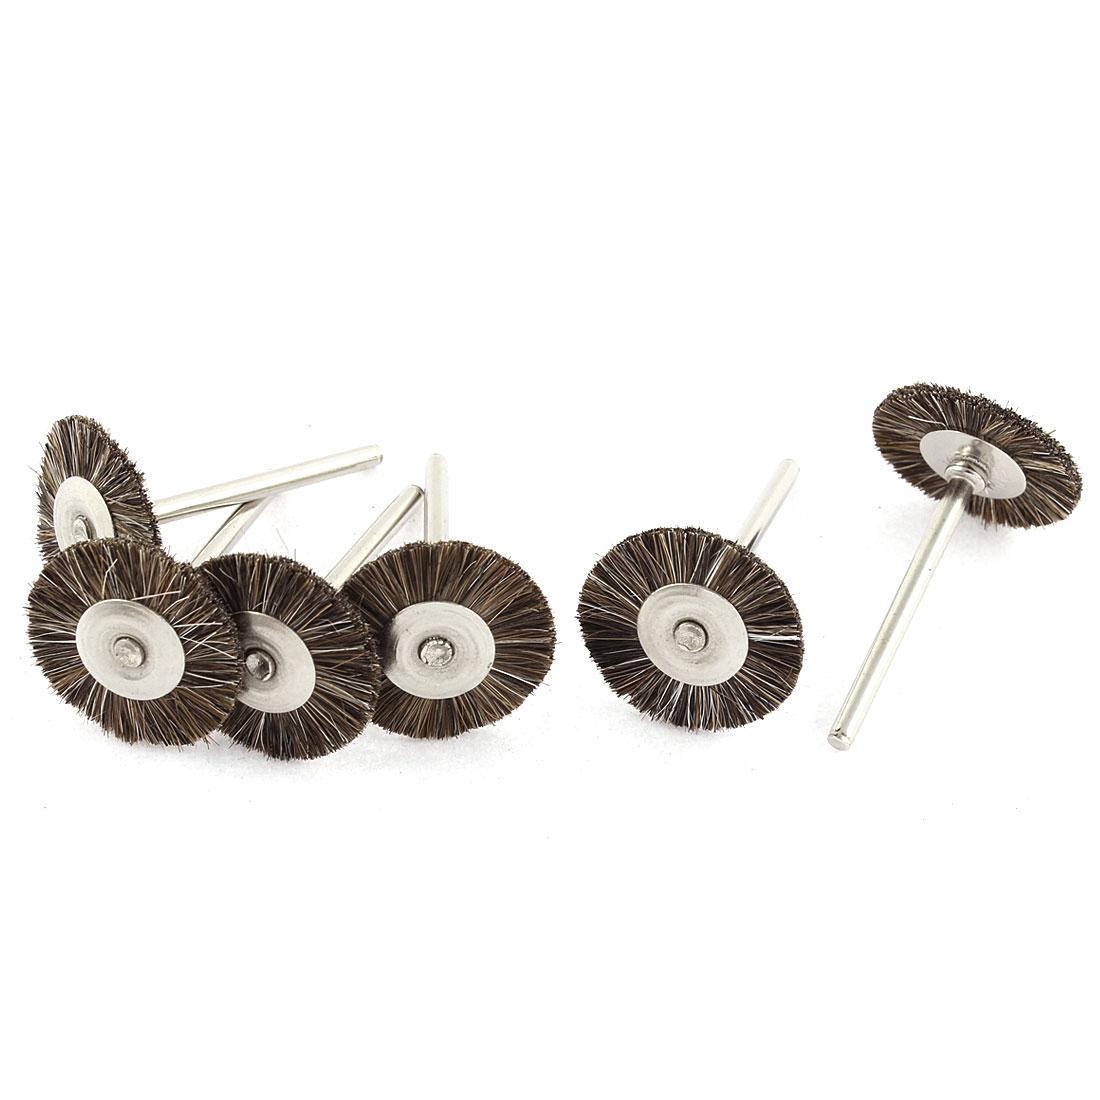 "Rotary Tool 1"" Bristle Head Jewelry Buffing Polishing Wheels Brushes Brown 6PCS"